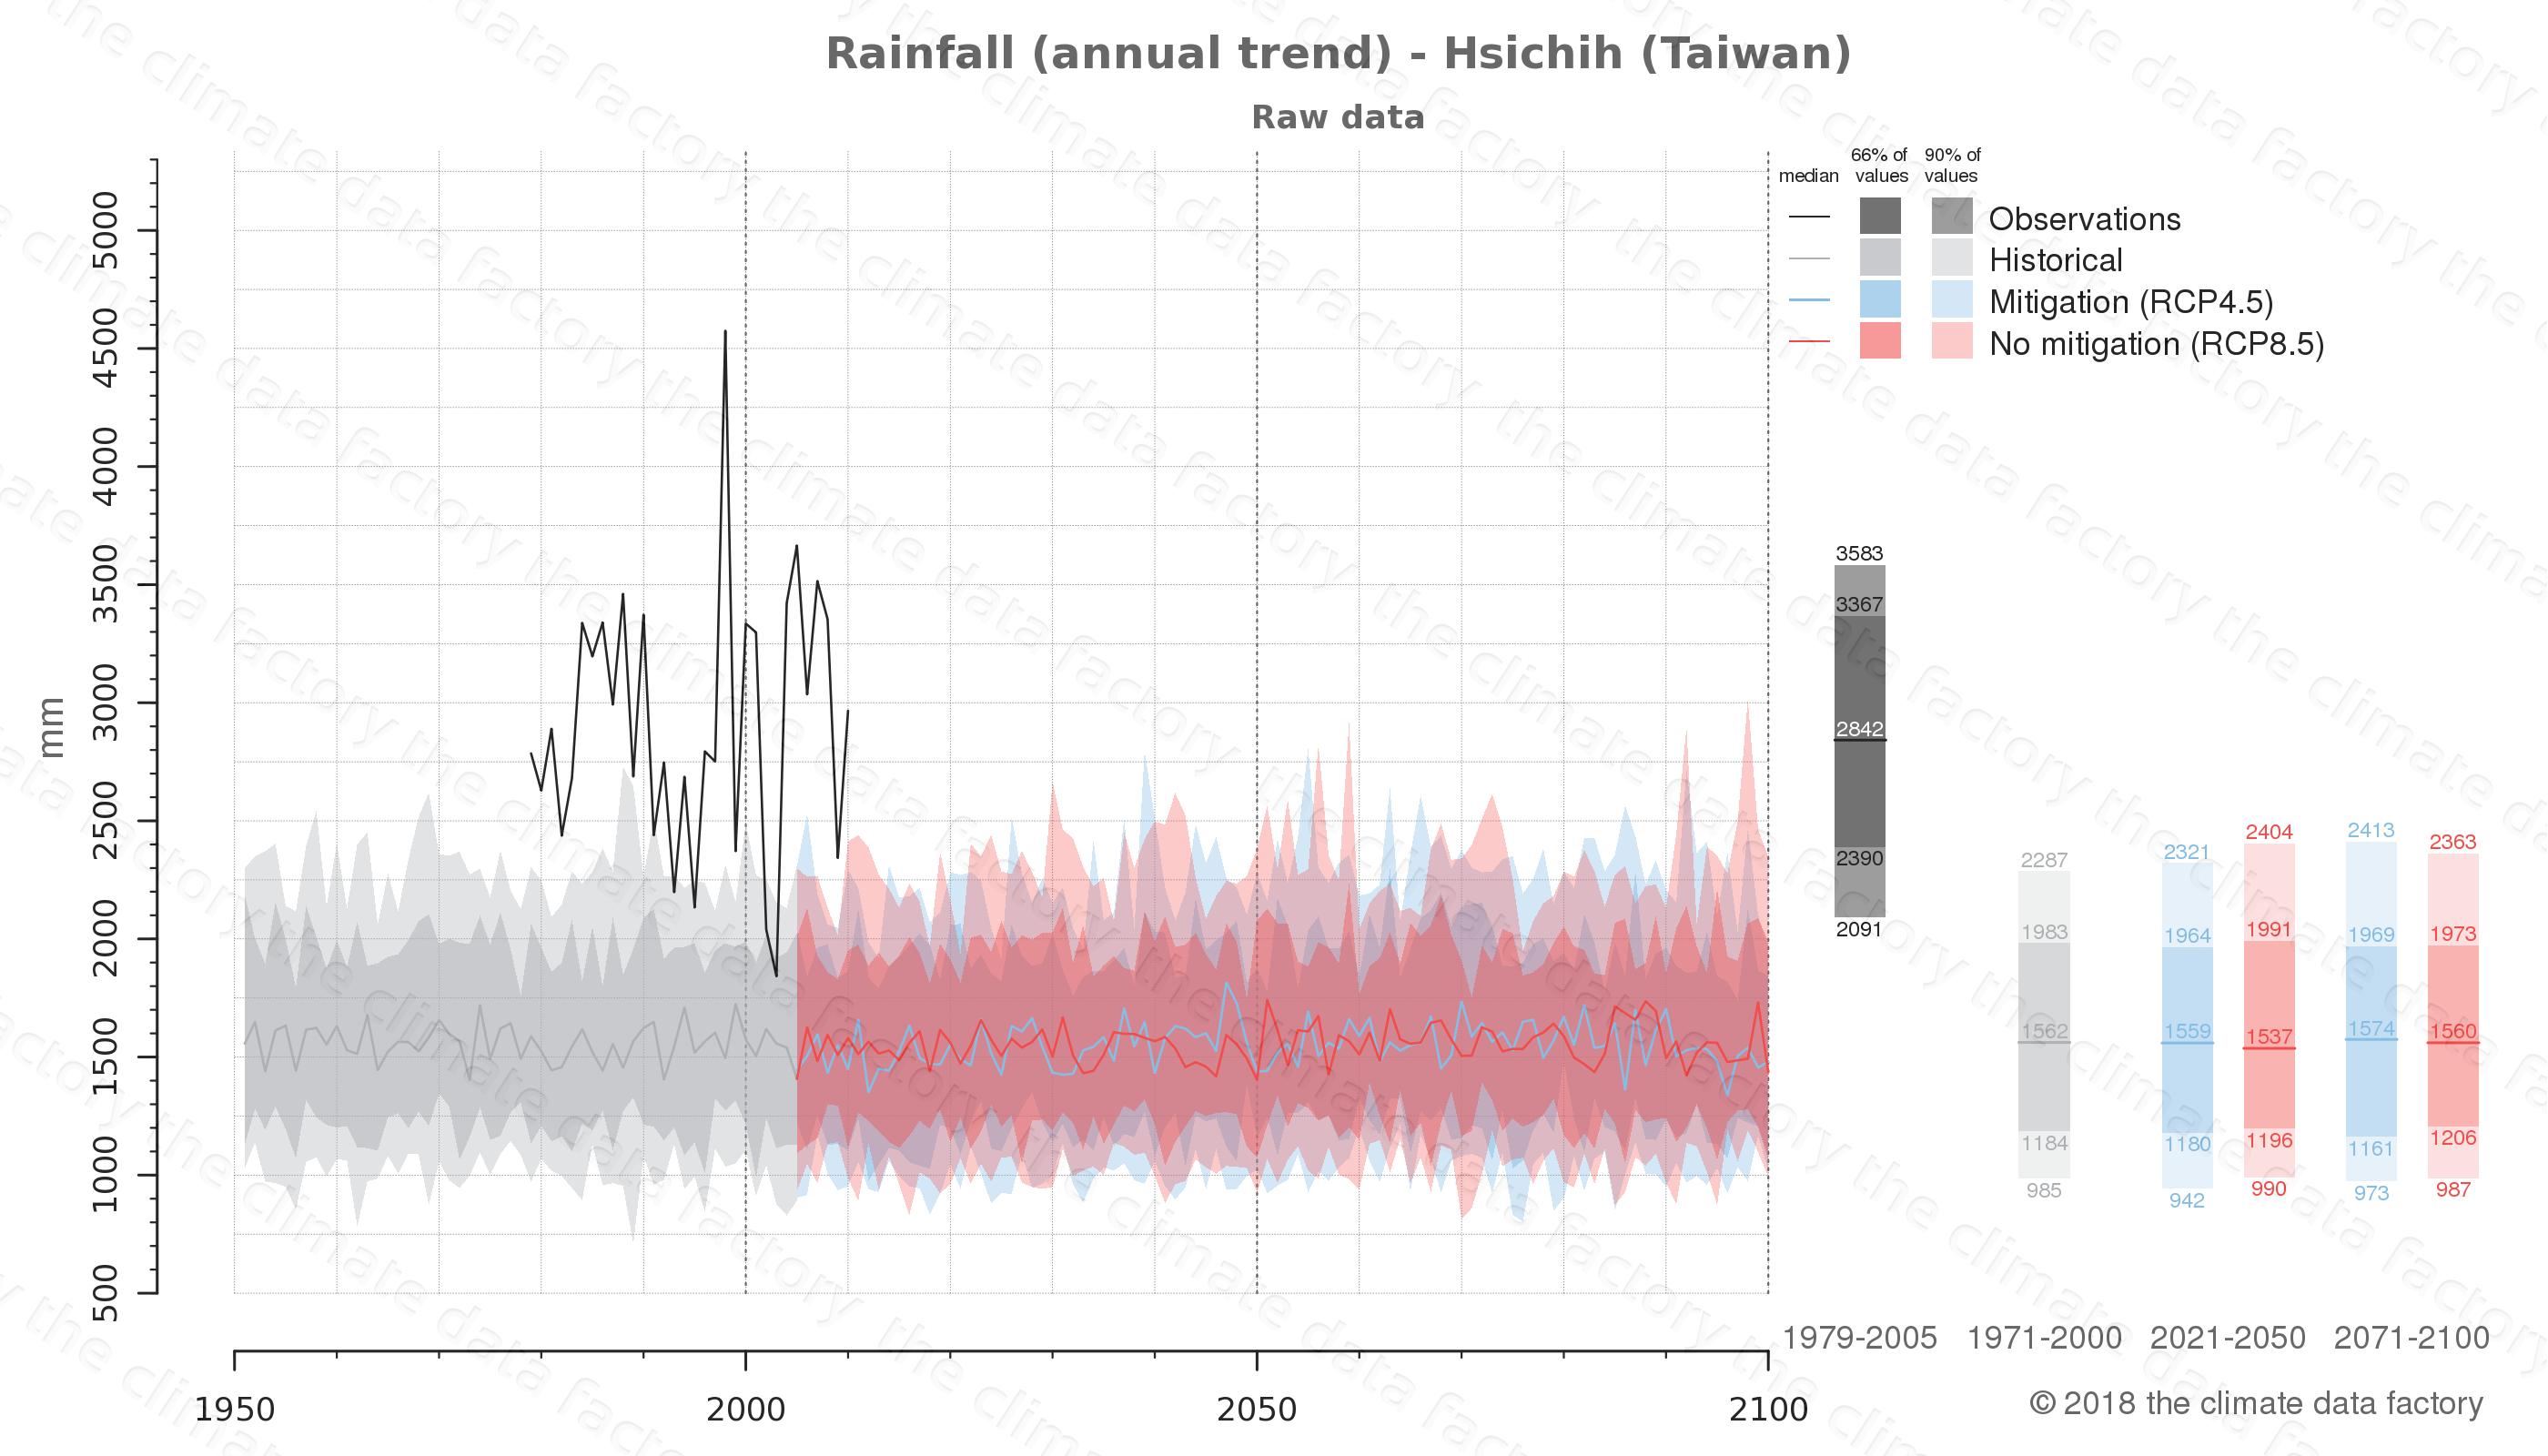 climate change data policy adaptation climate graph city data rainfall hsichih taiwan